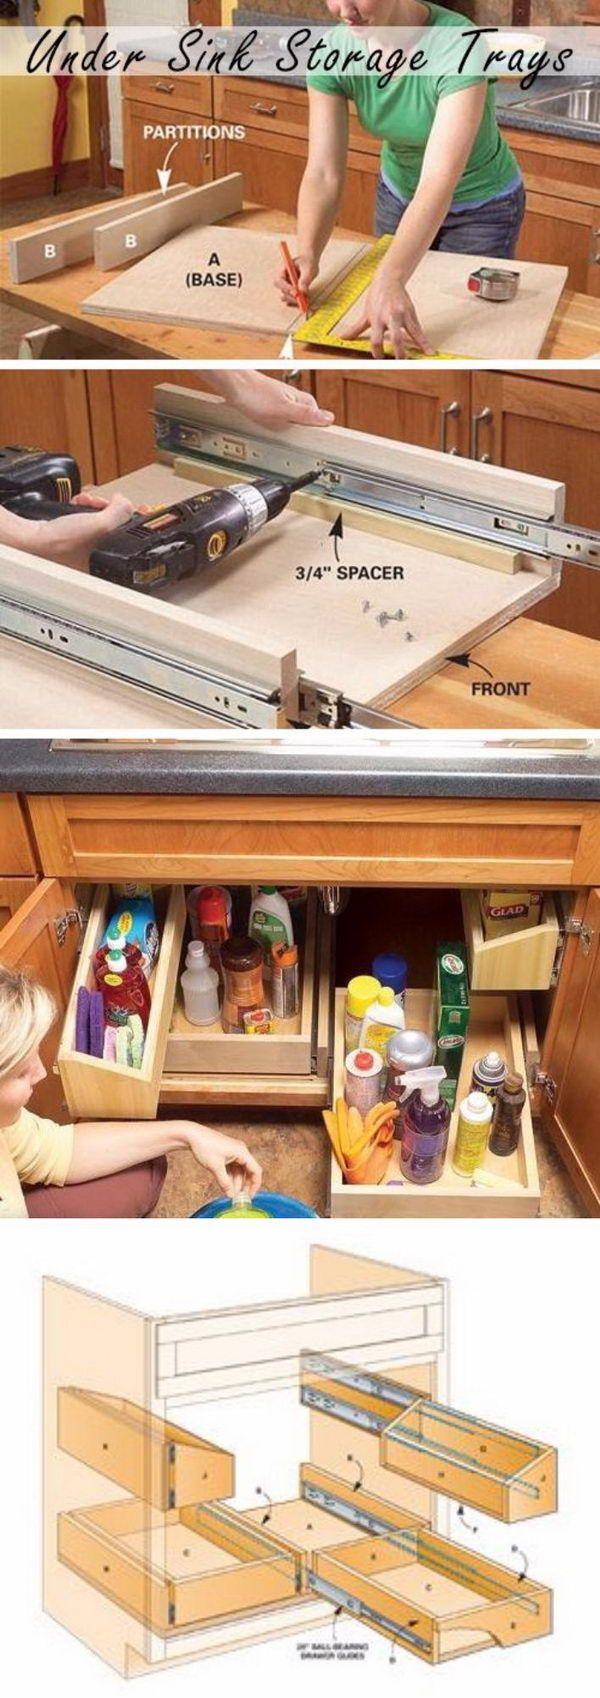 DIY Pull Out Kitchen Sink Storage Trays.